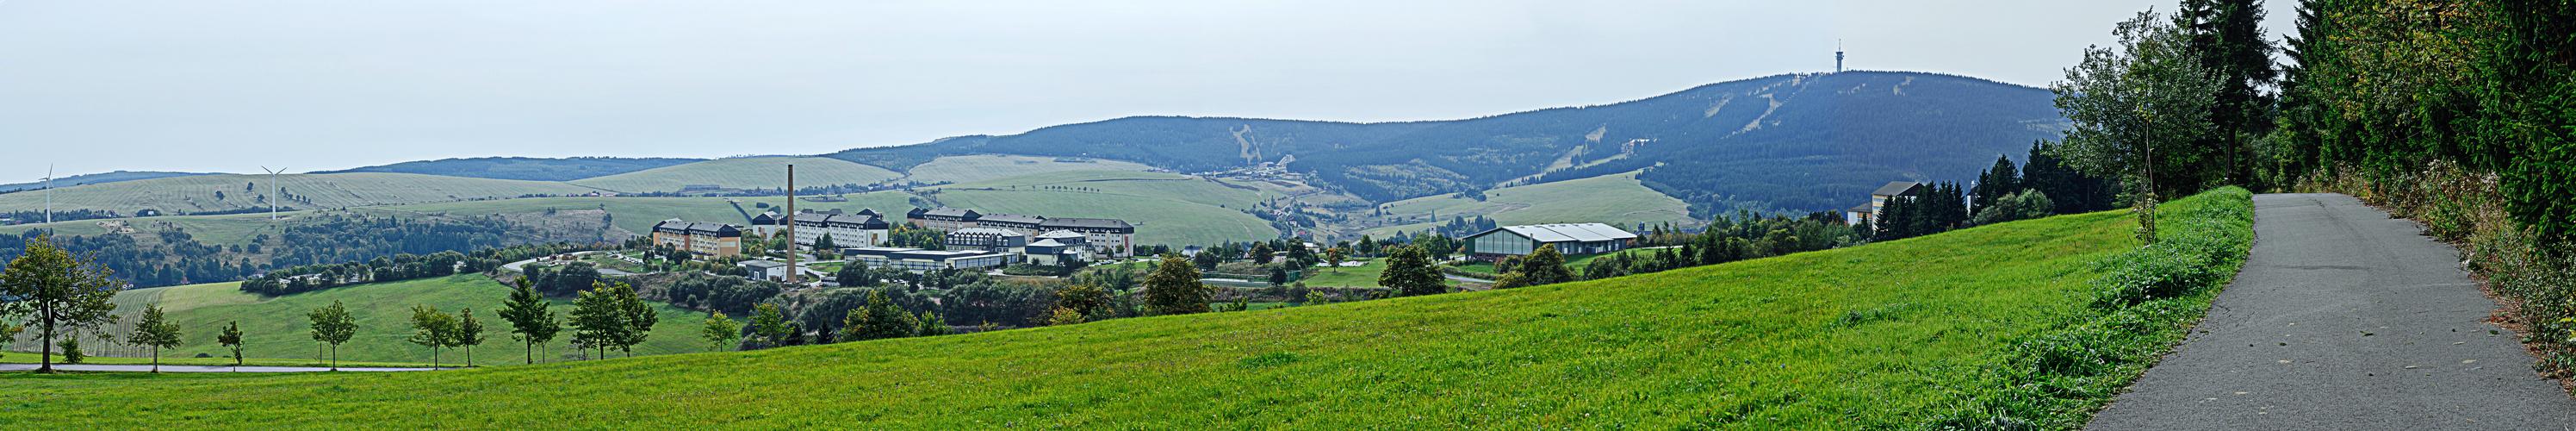 Oberwiesenthal mit Keilberg